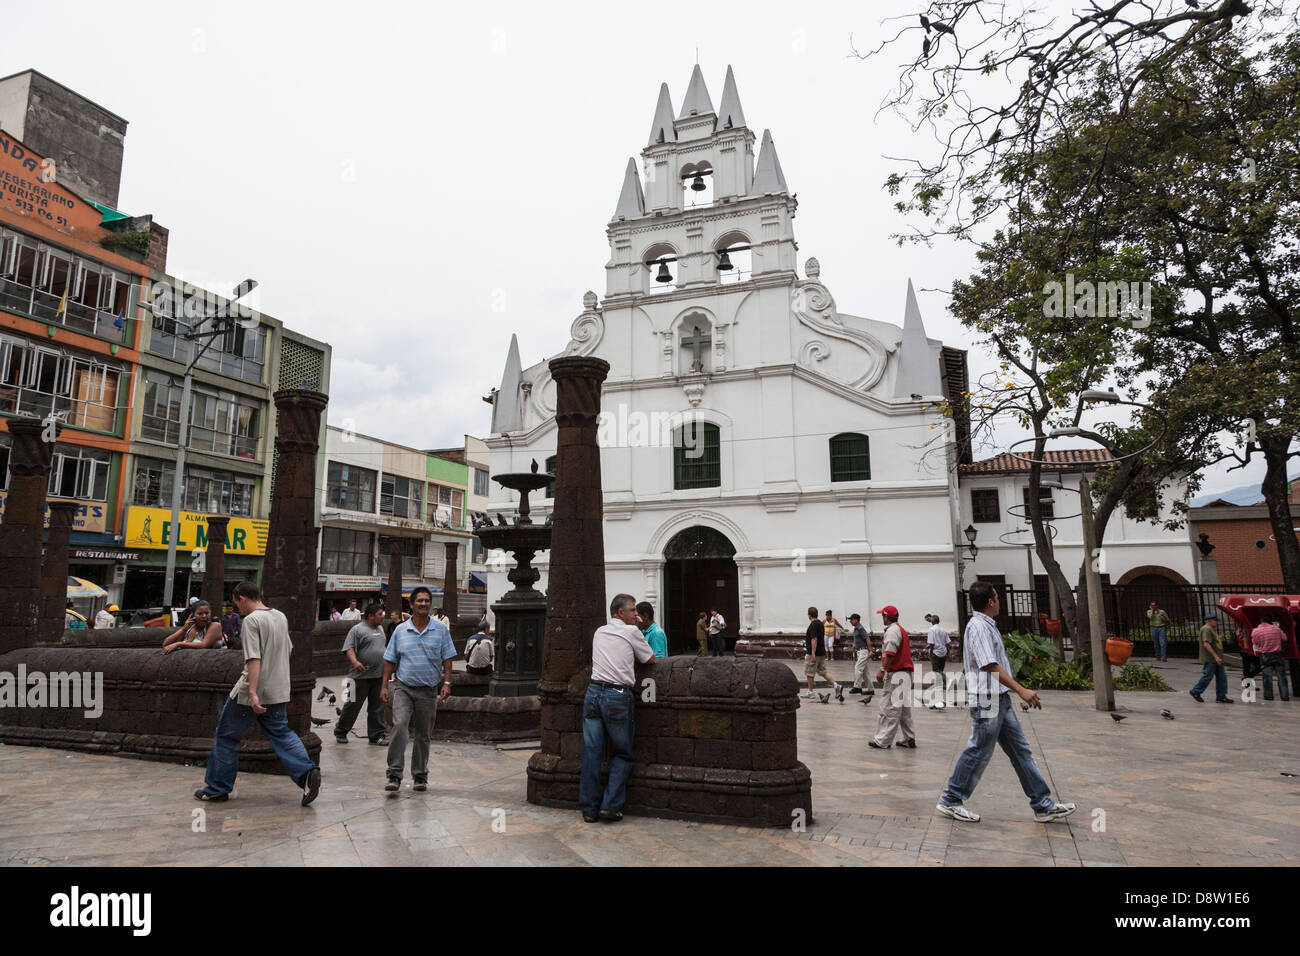 Iglesia de la Veracruz, La Veracruz Church, Medellin, Colombia - Stock Image